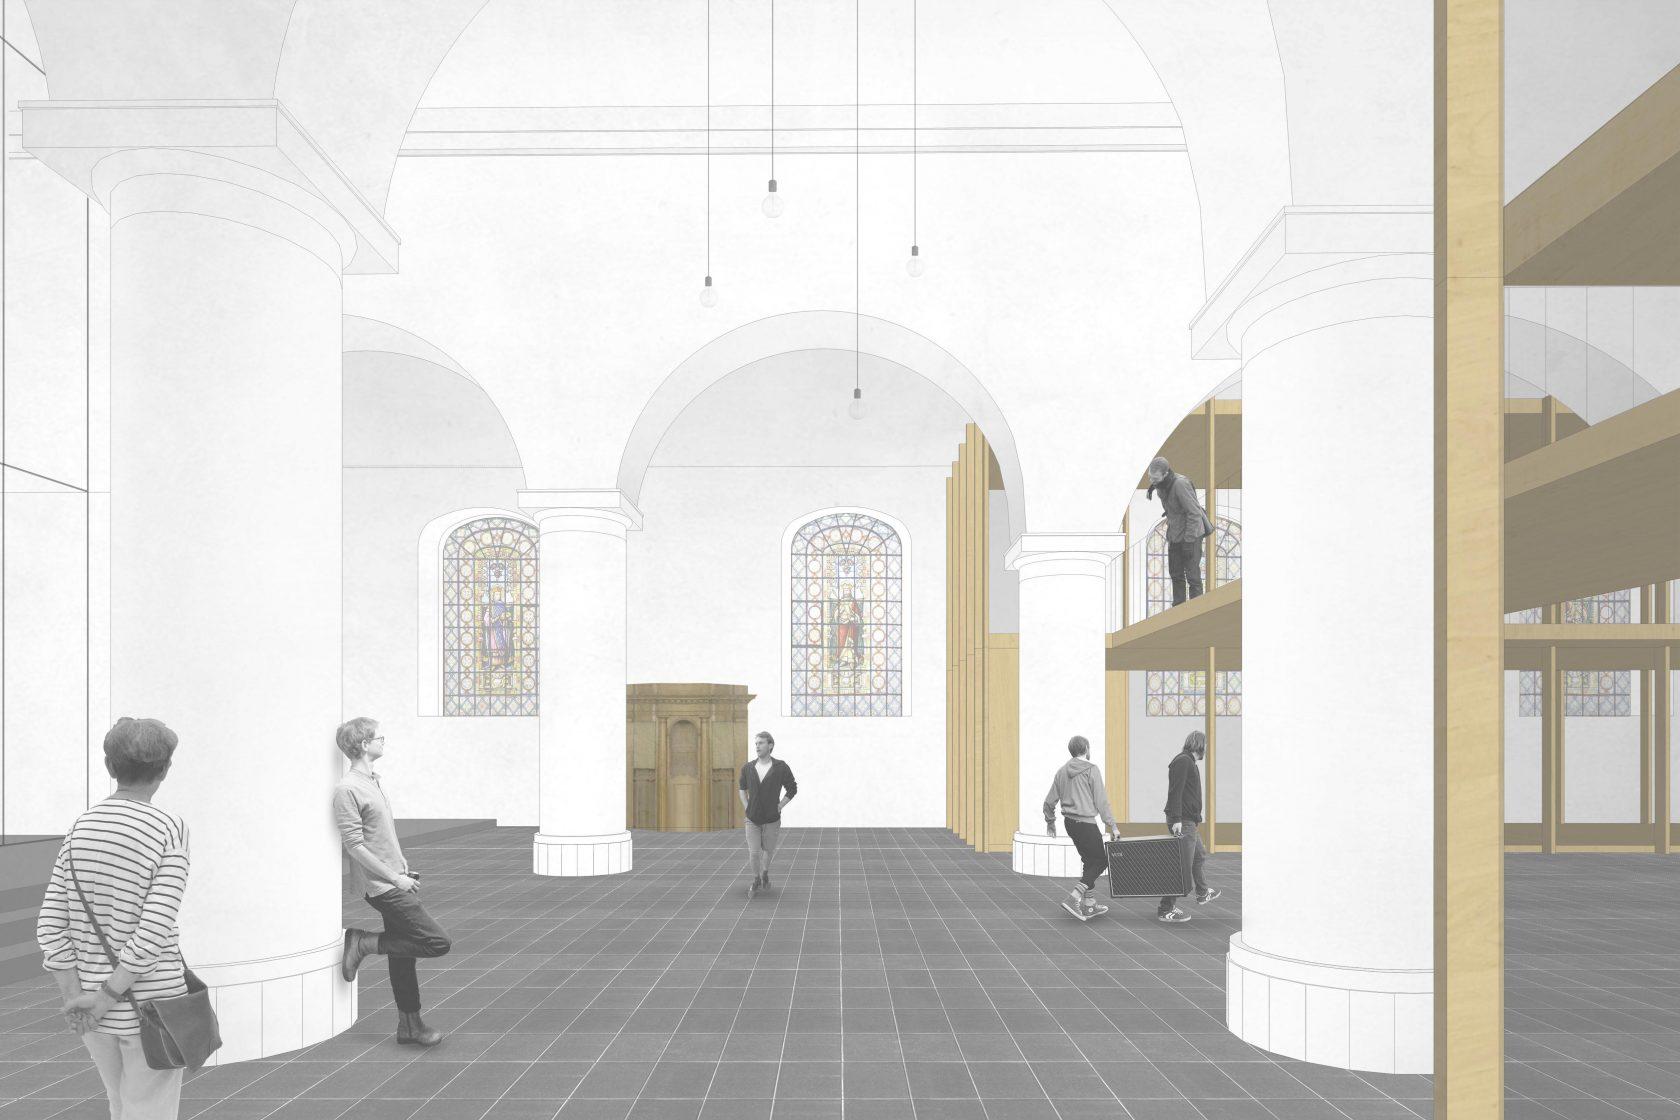 BCQ architecten & ARC - sfeerbeeld kerk 02 Aalbeke